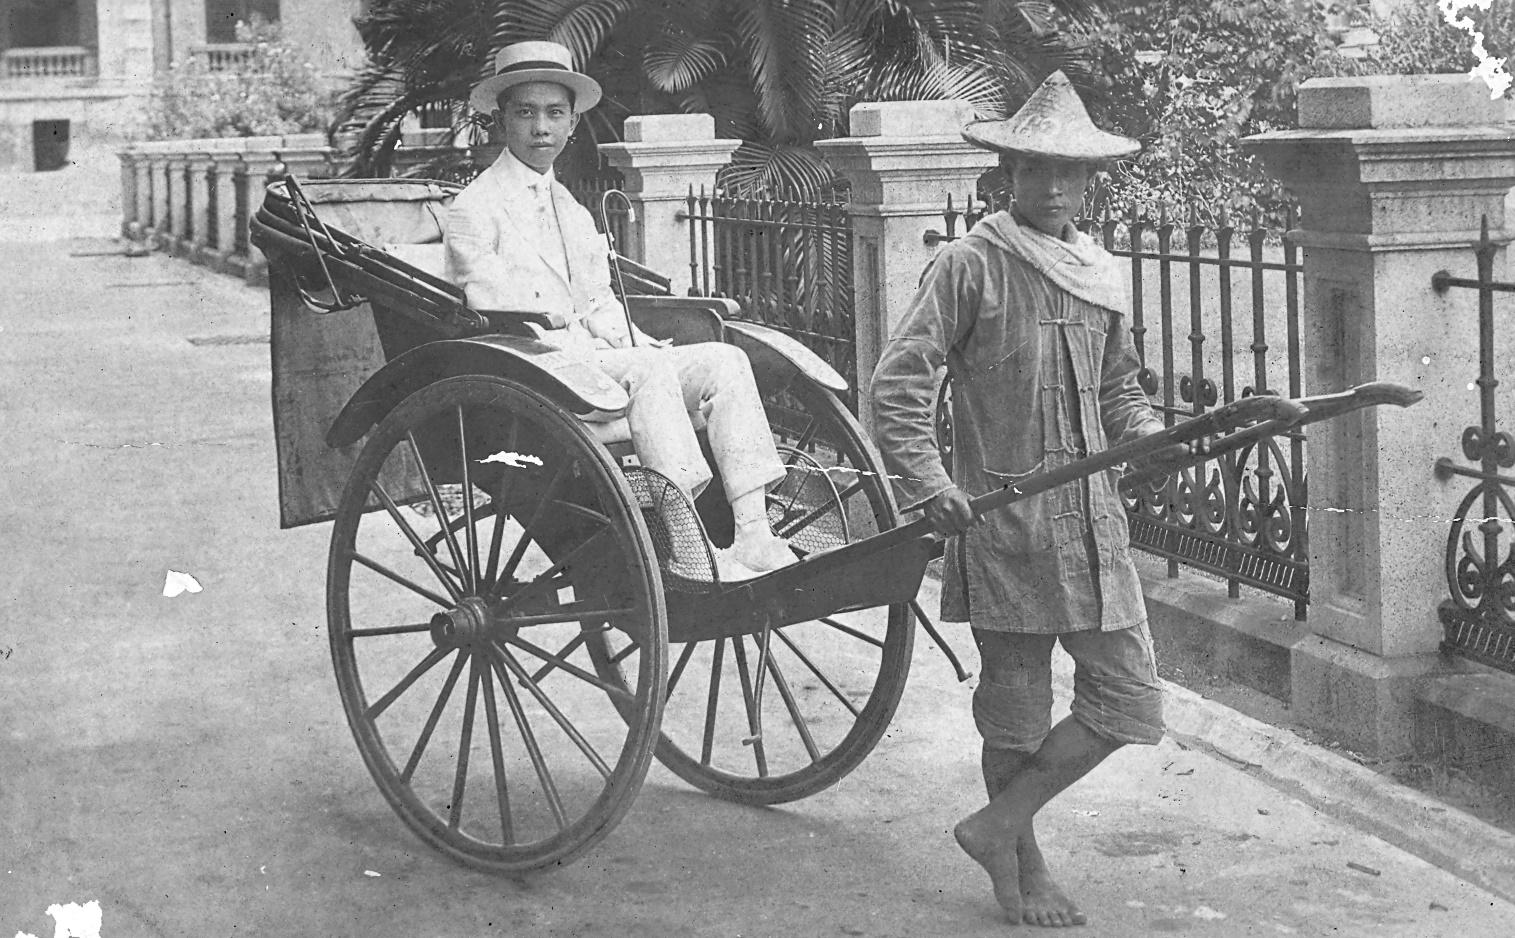 CPR on a rickshaw